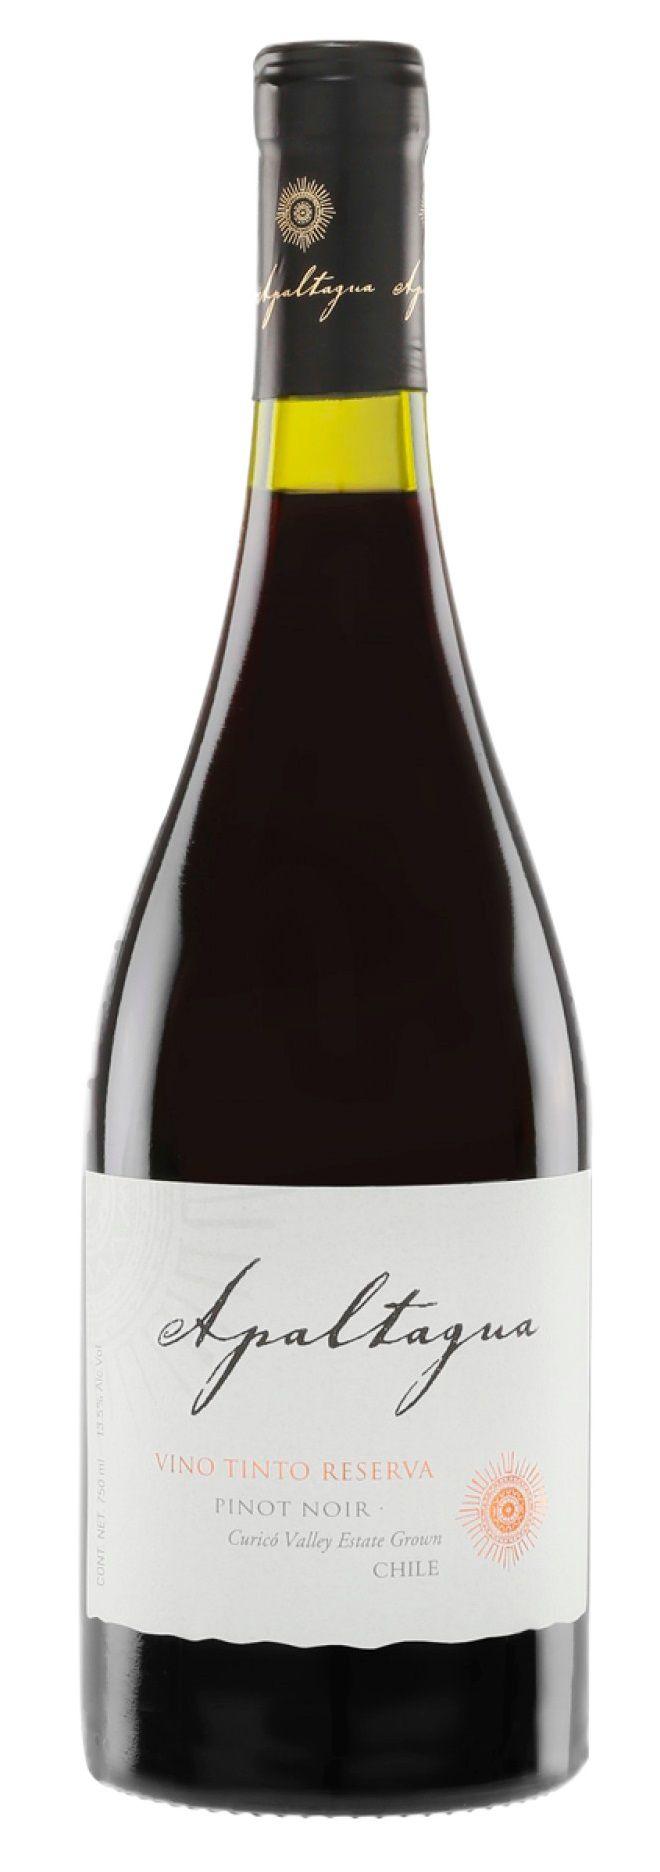 Vinho Apaltagua Reserva Pinot Noir